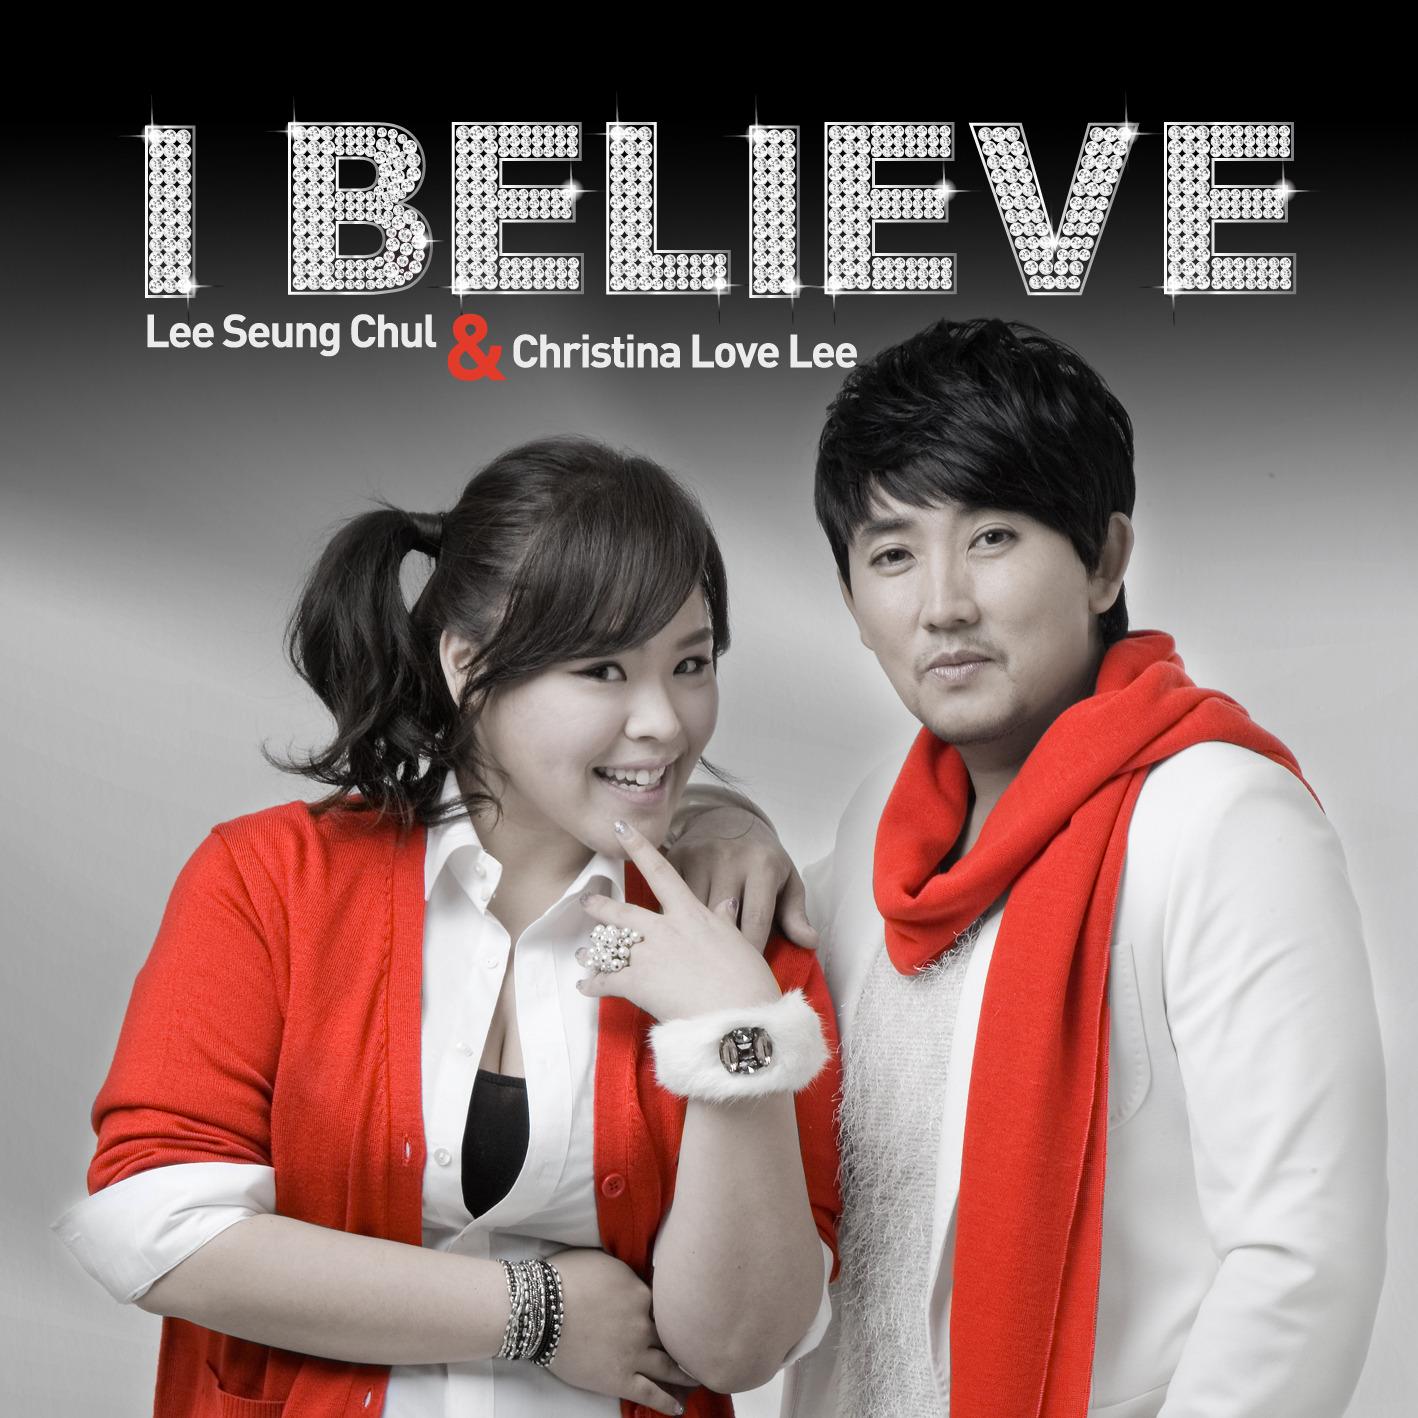 video  lee seung chul  u0026 christina love lee release mv for  u0026quot i believe u0026quot